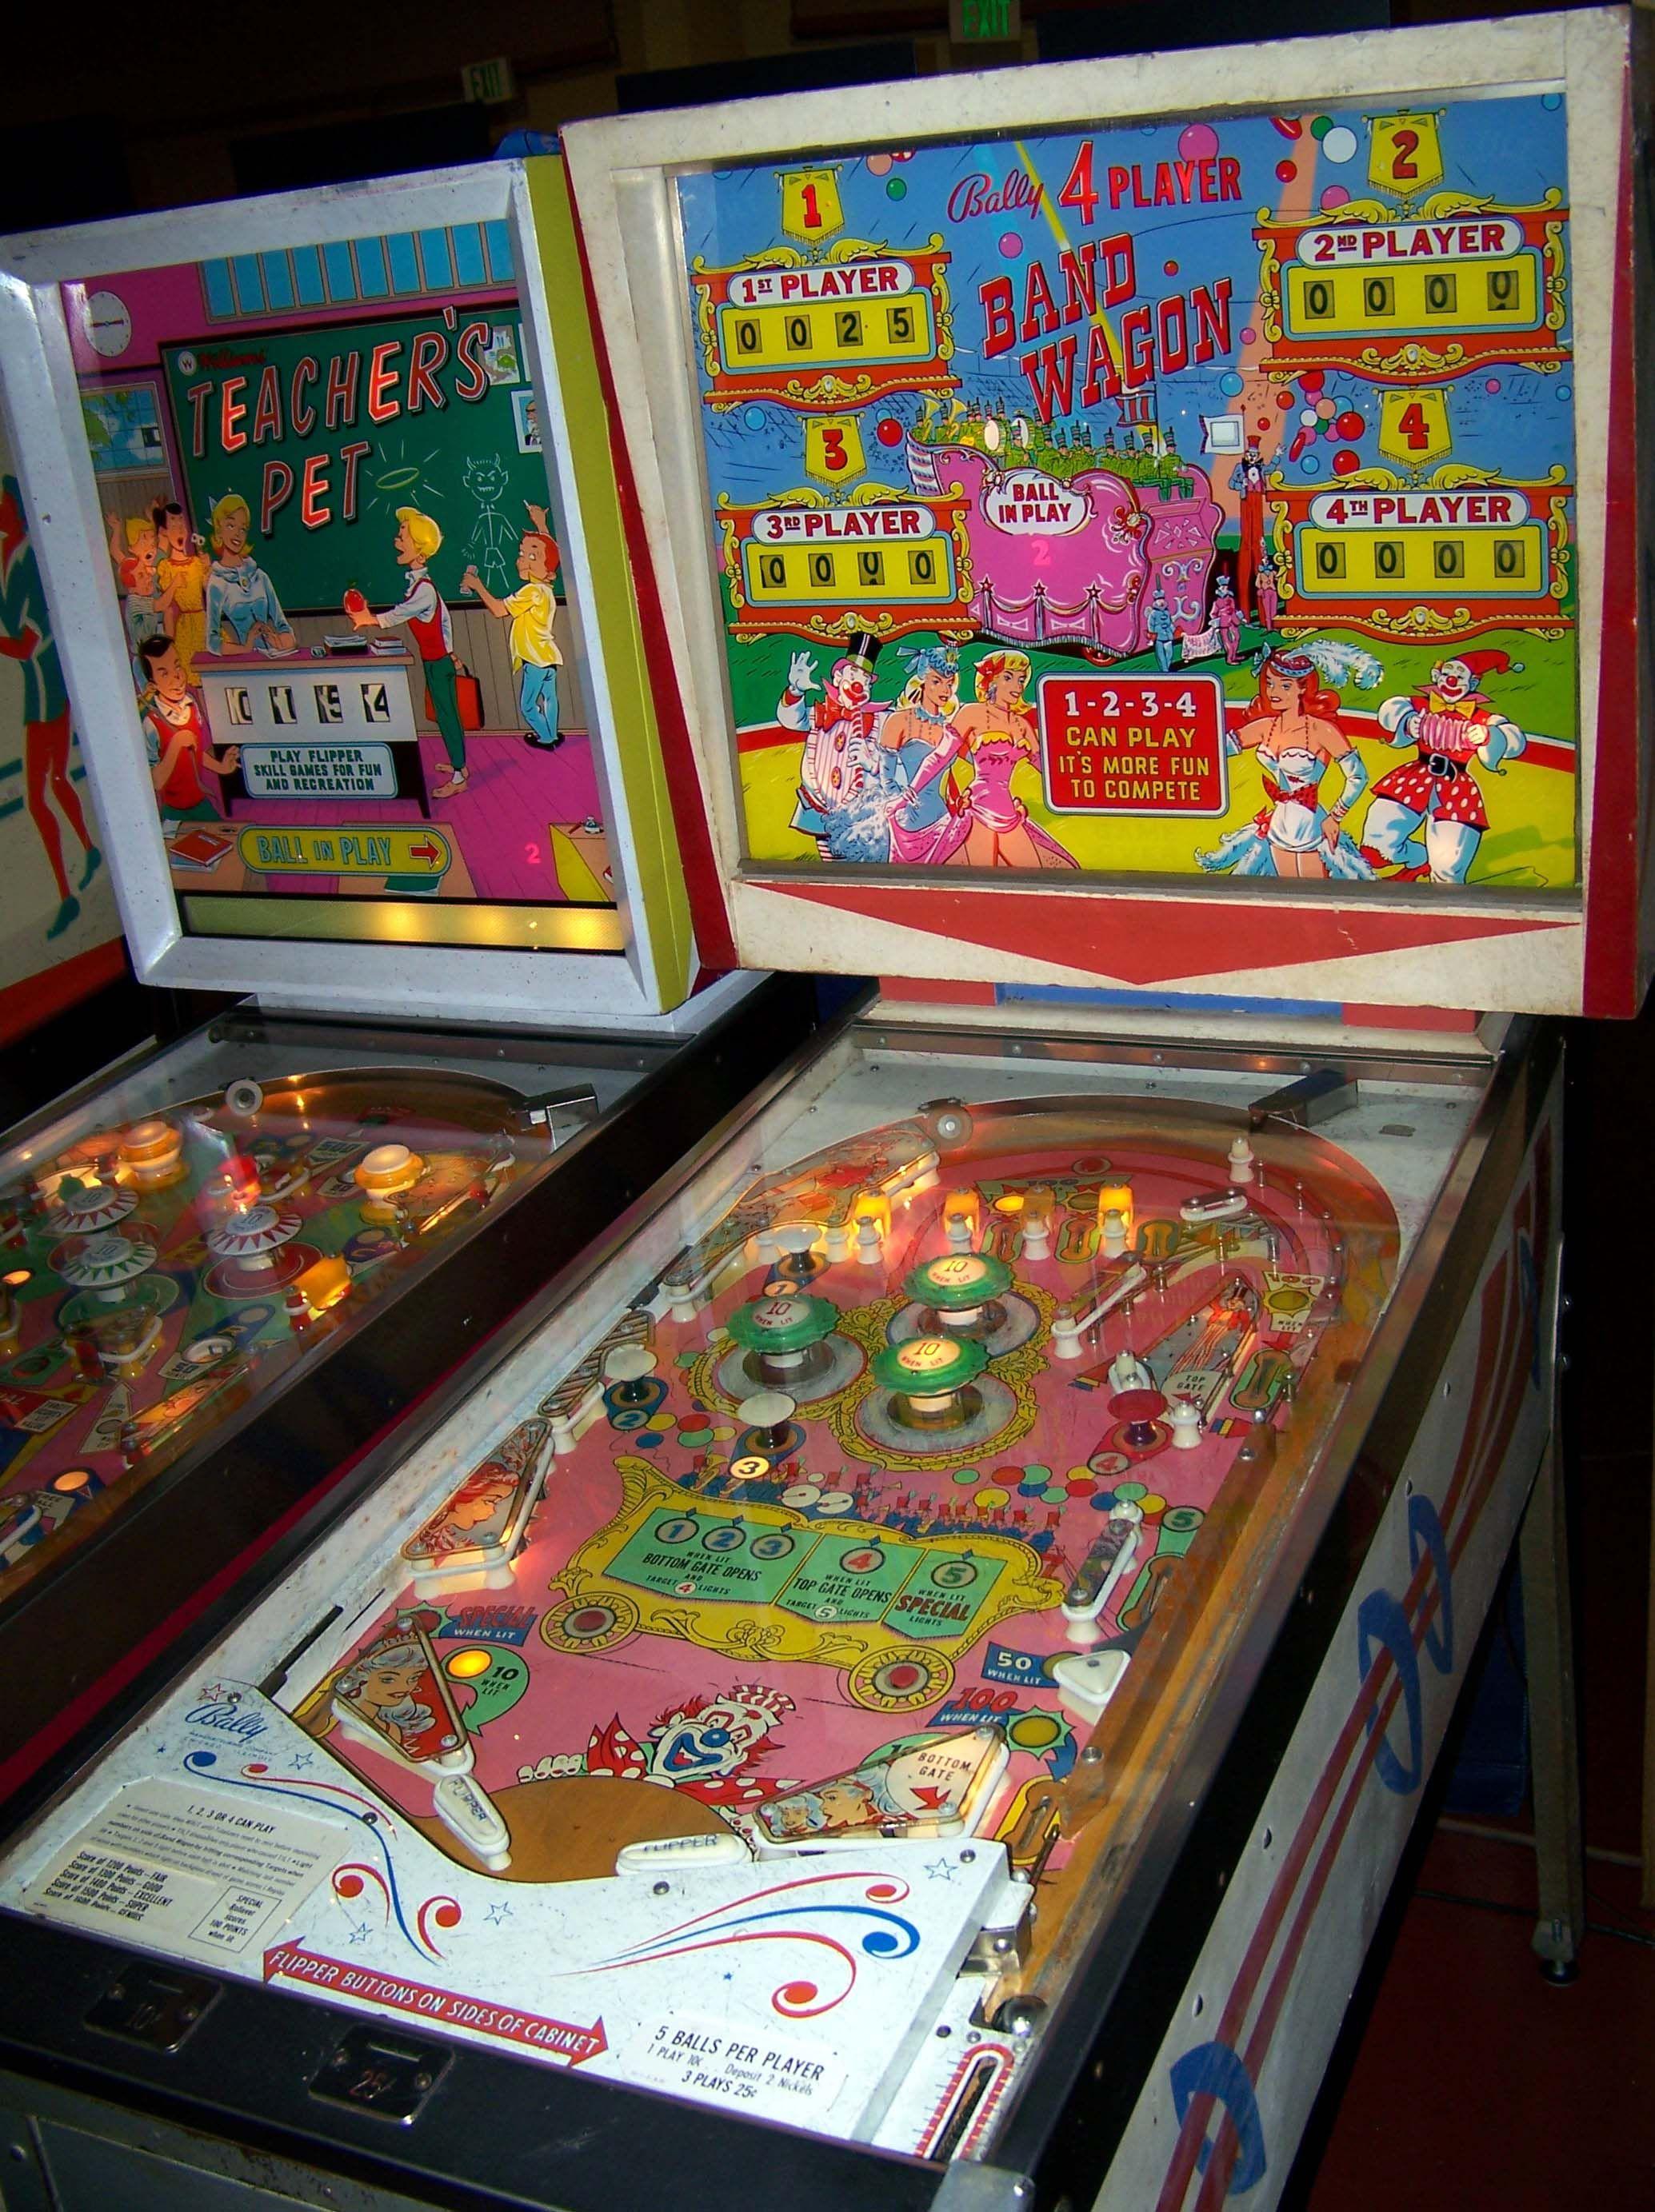 Juegos TreasureMile com bally slot machines-416672